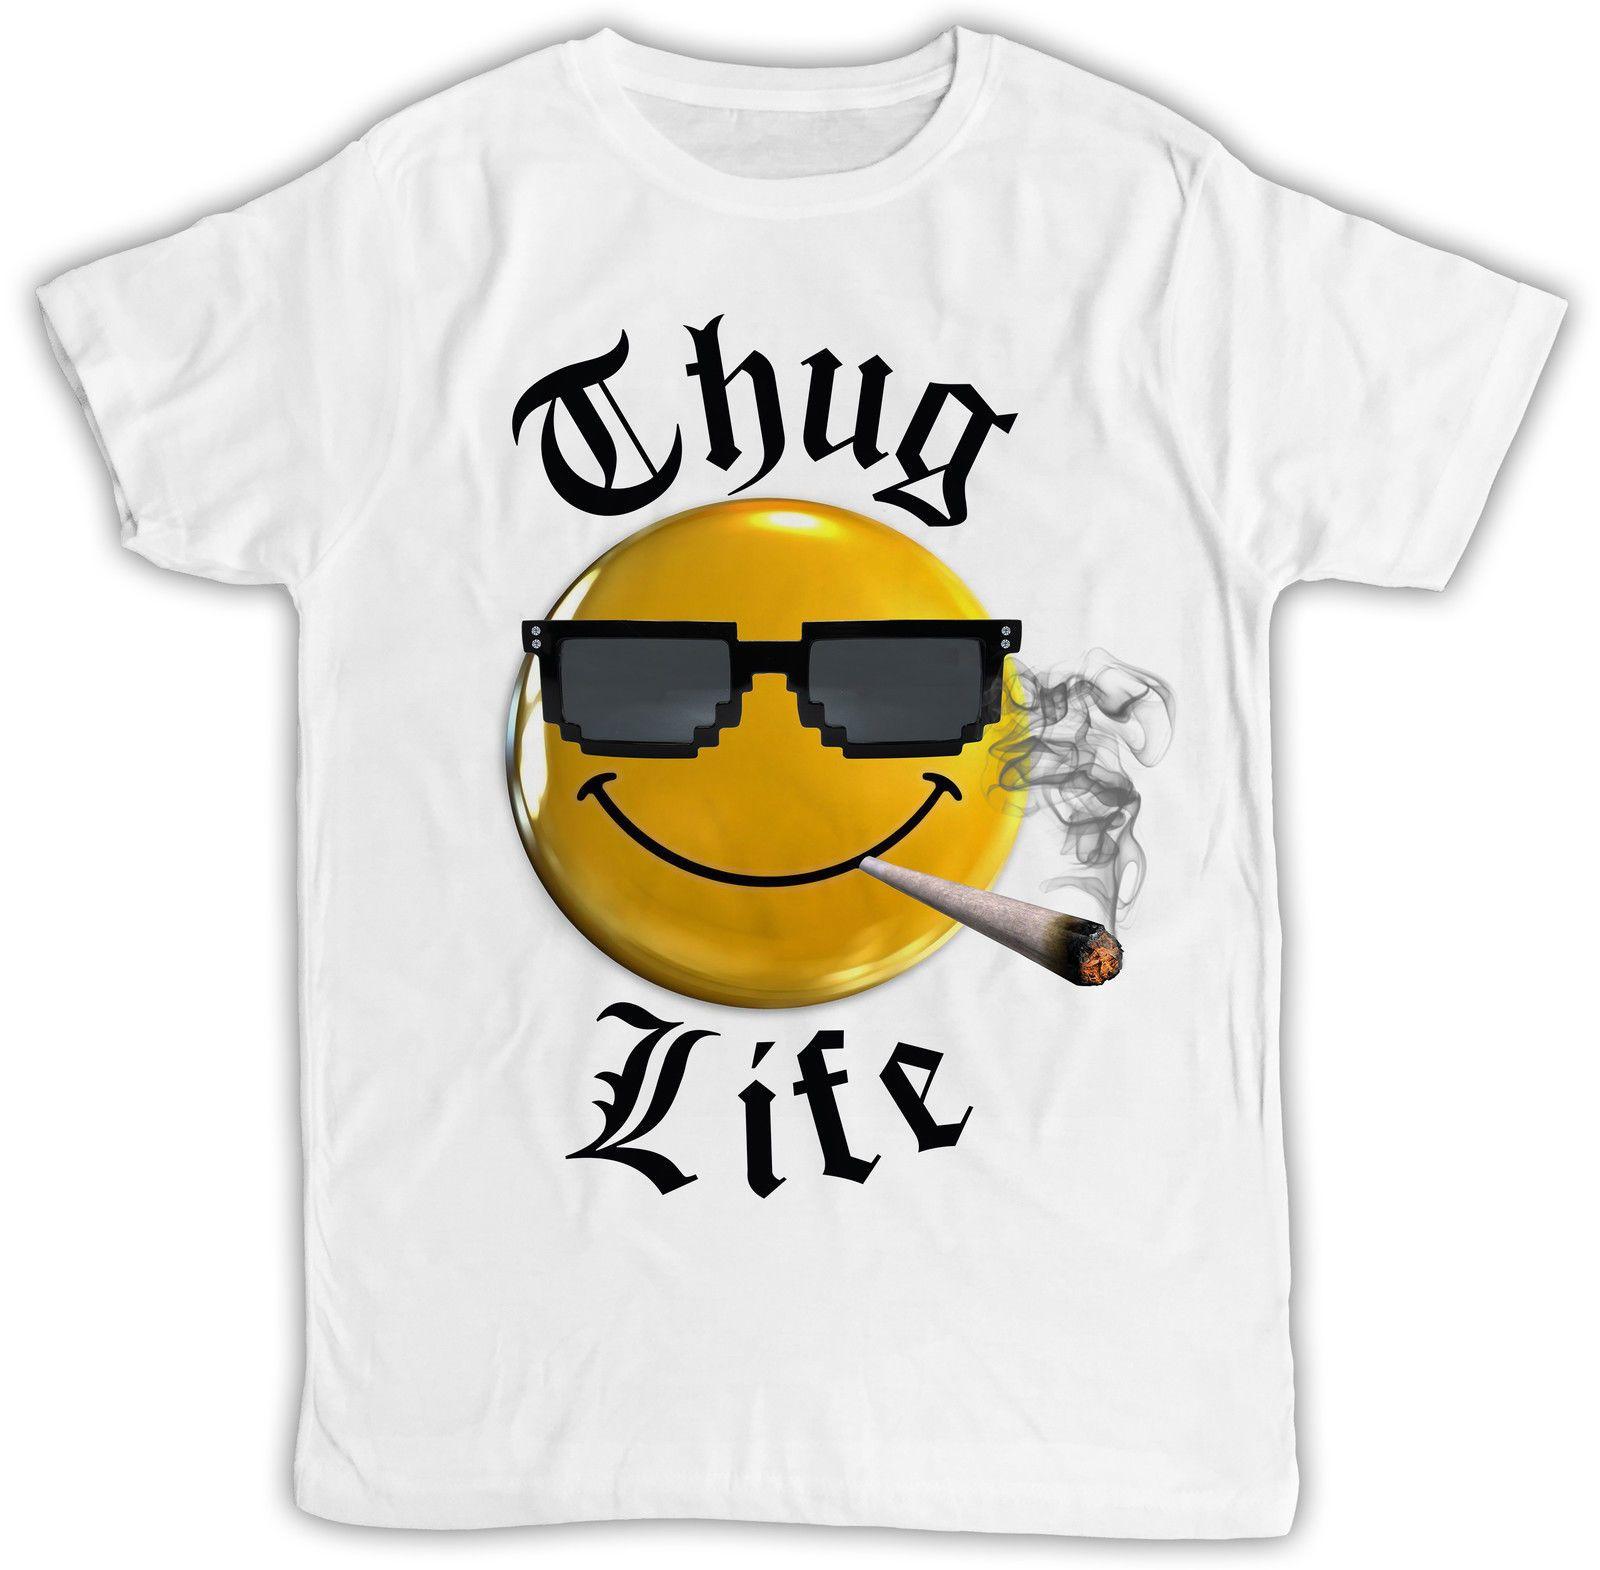 ffc9a977bca2 FUNNY THUG LIFE IDEAL GIFT BIRTHDAY PRESENT DESIGNER SHORT SLEEVE MENS T  SHIRT O Neck T Shirt Casual O Neck Print Tops T Shirts Men Shirt Online  Cartoon T ...